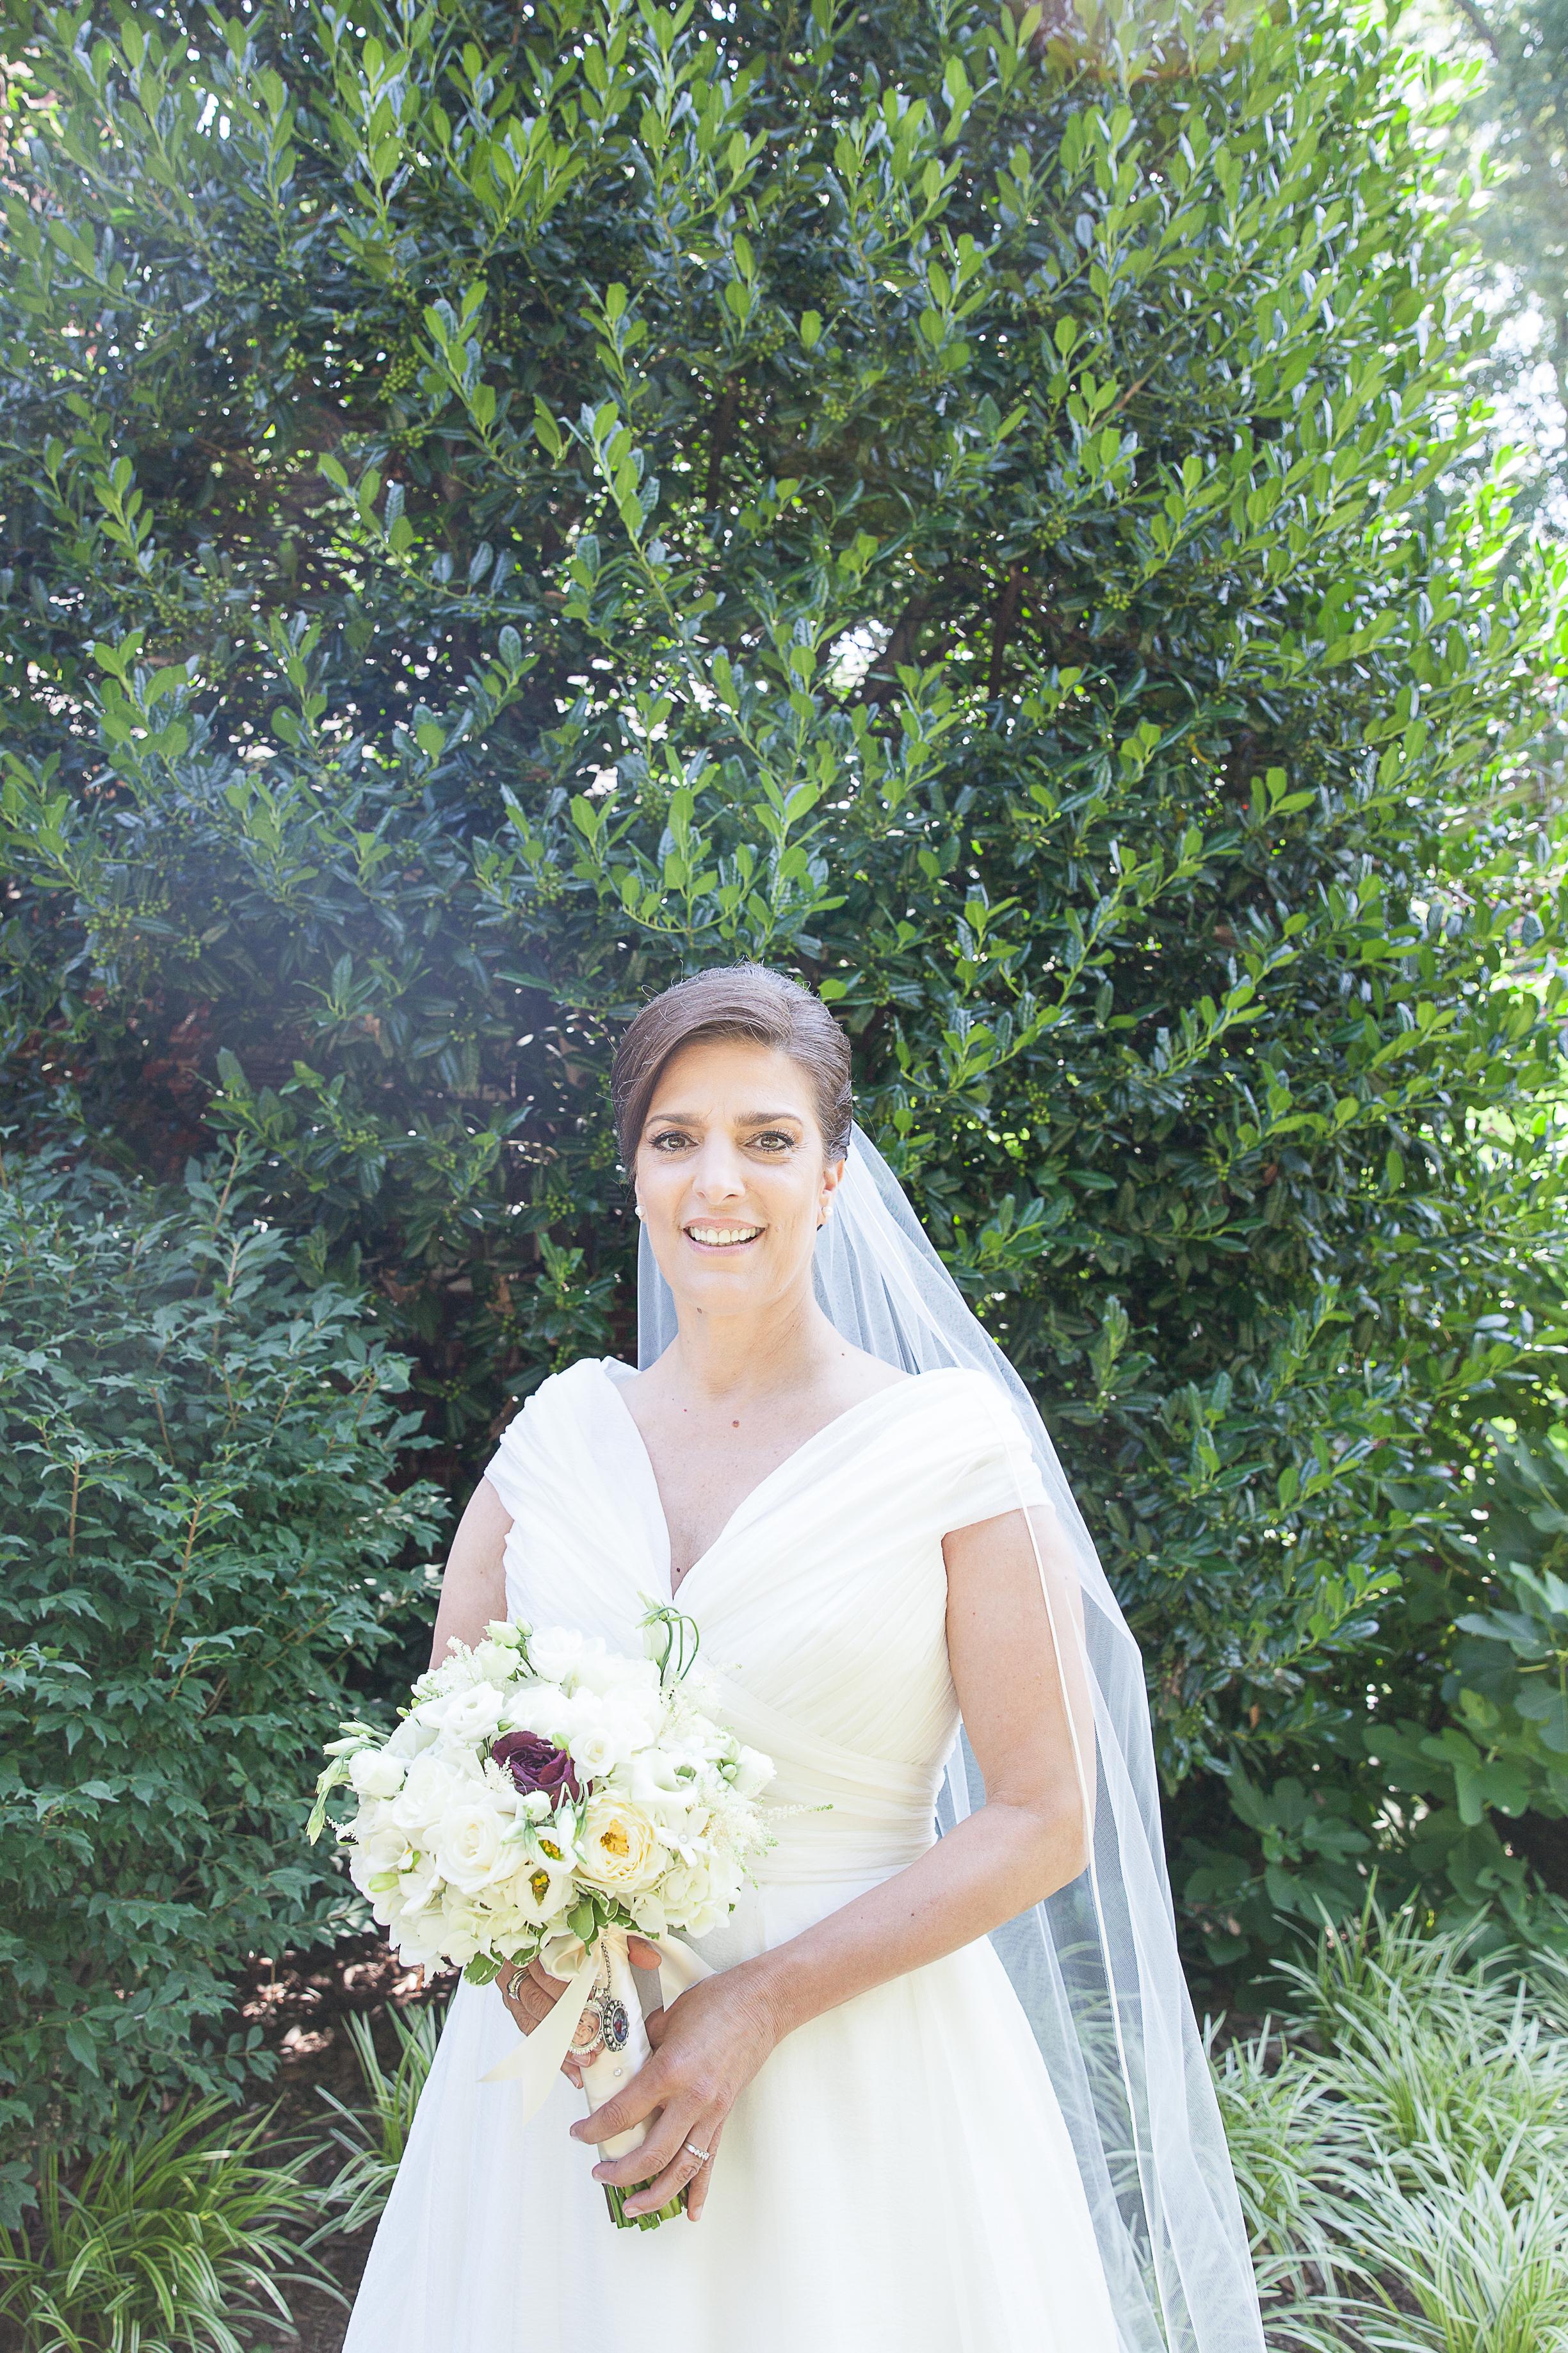 Tina-Paul-Wedding-Kim-Pham-Clark-Photography-07.jpg